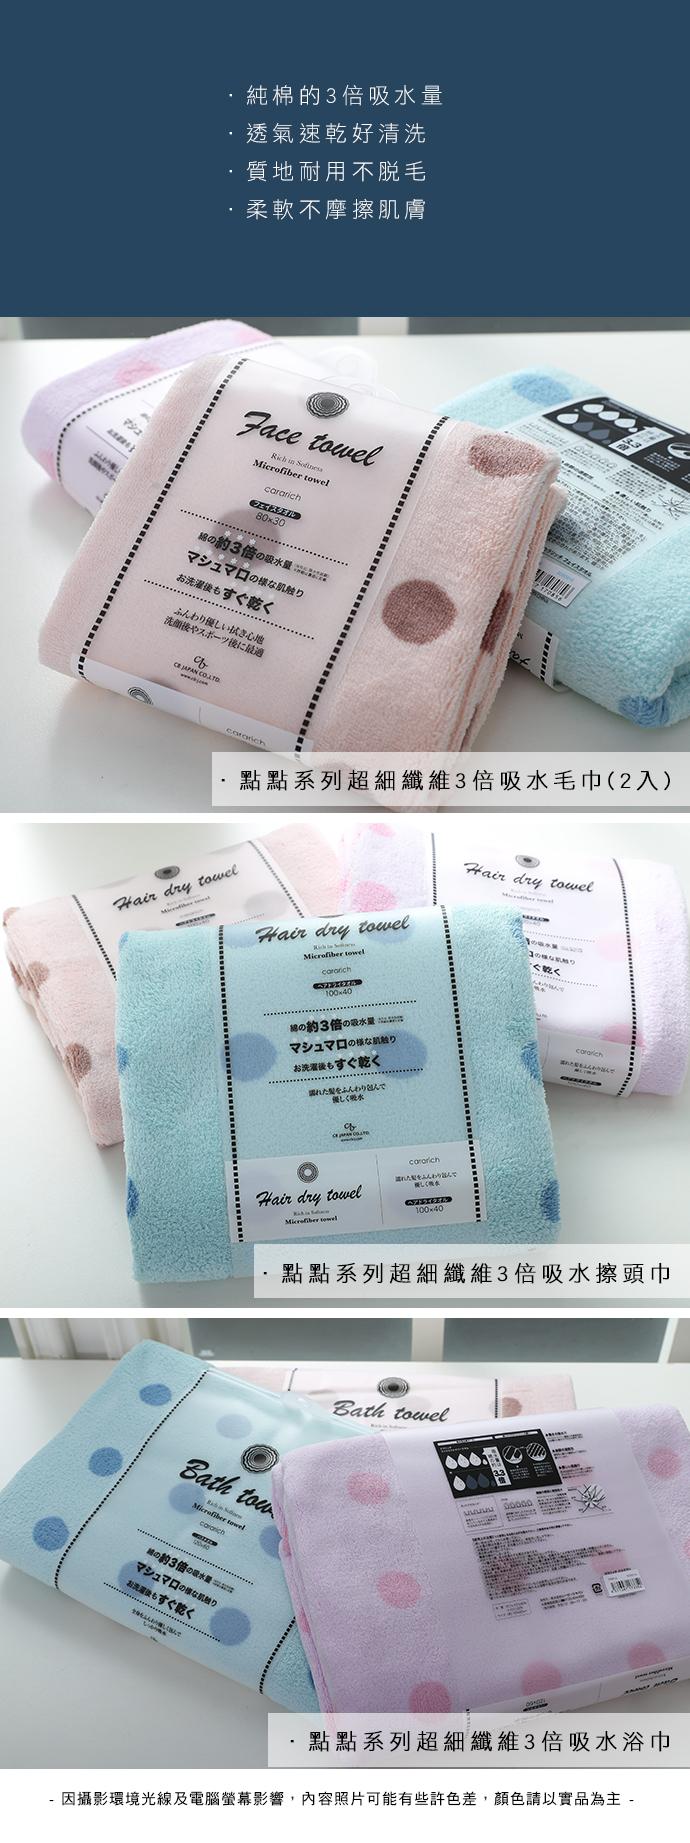 CB Japan|點點系列超細纖維3倍吸水擦頭巾 - 點點粉